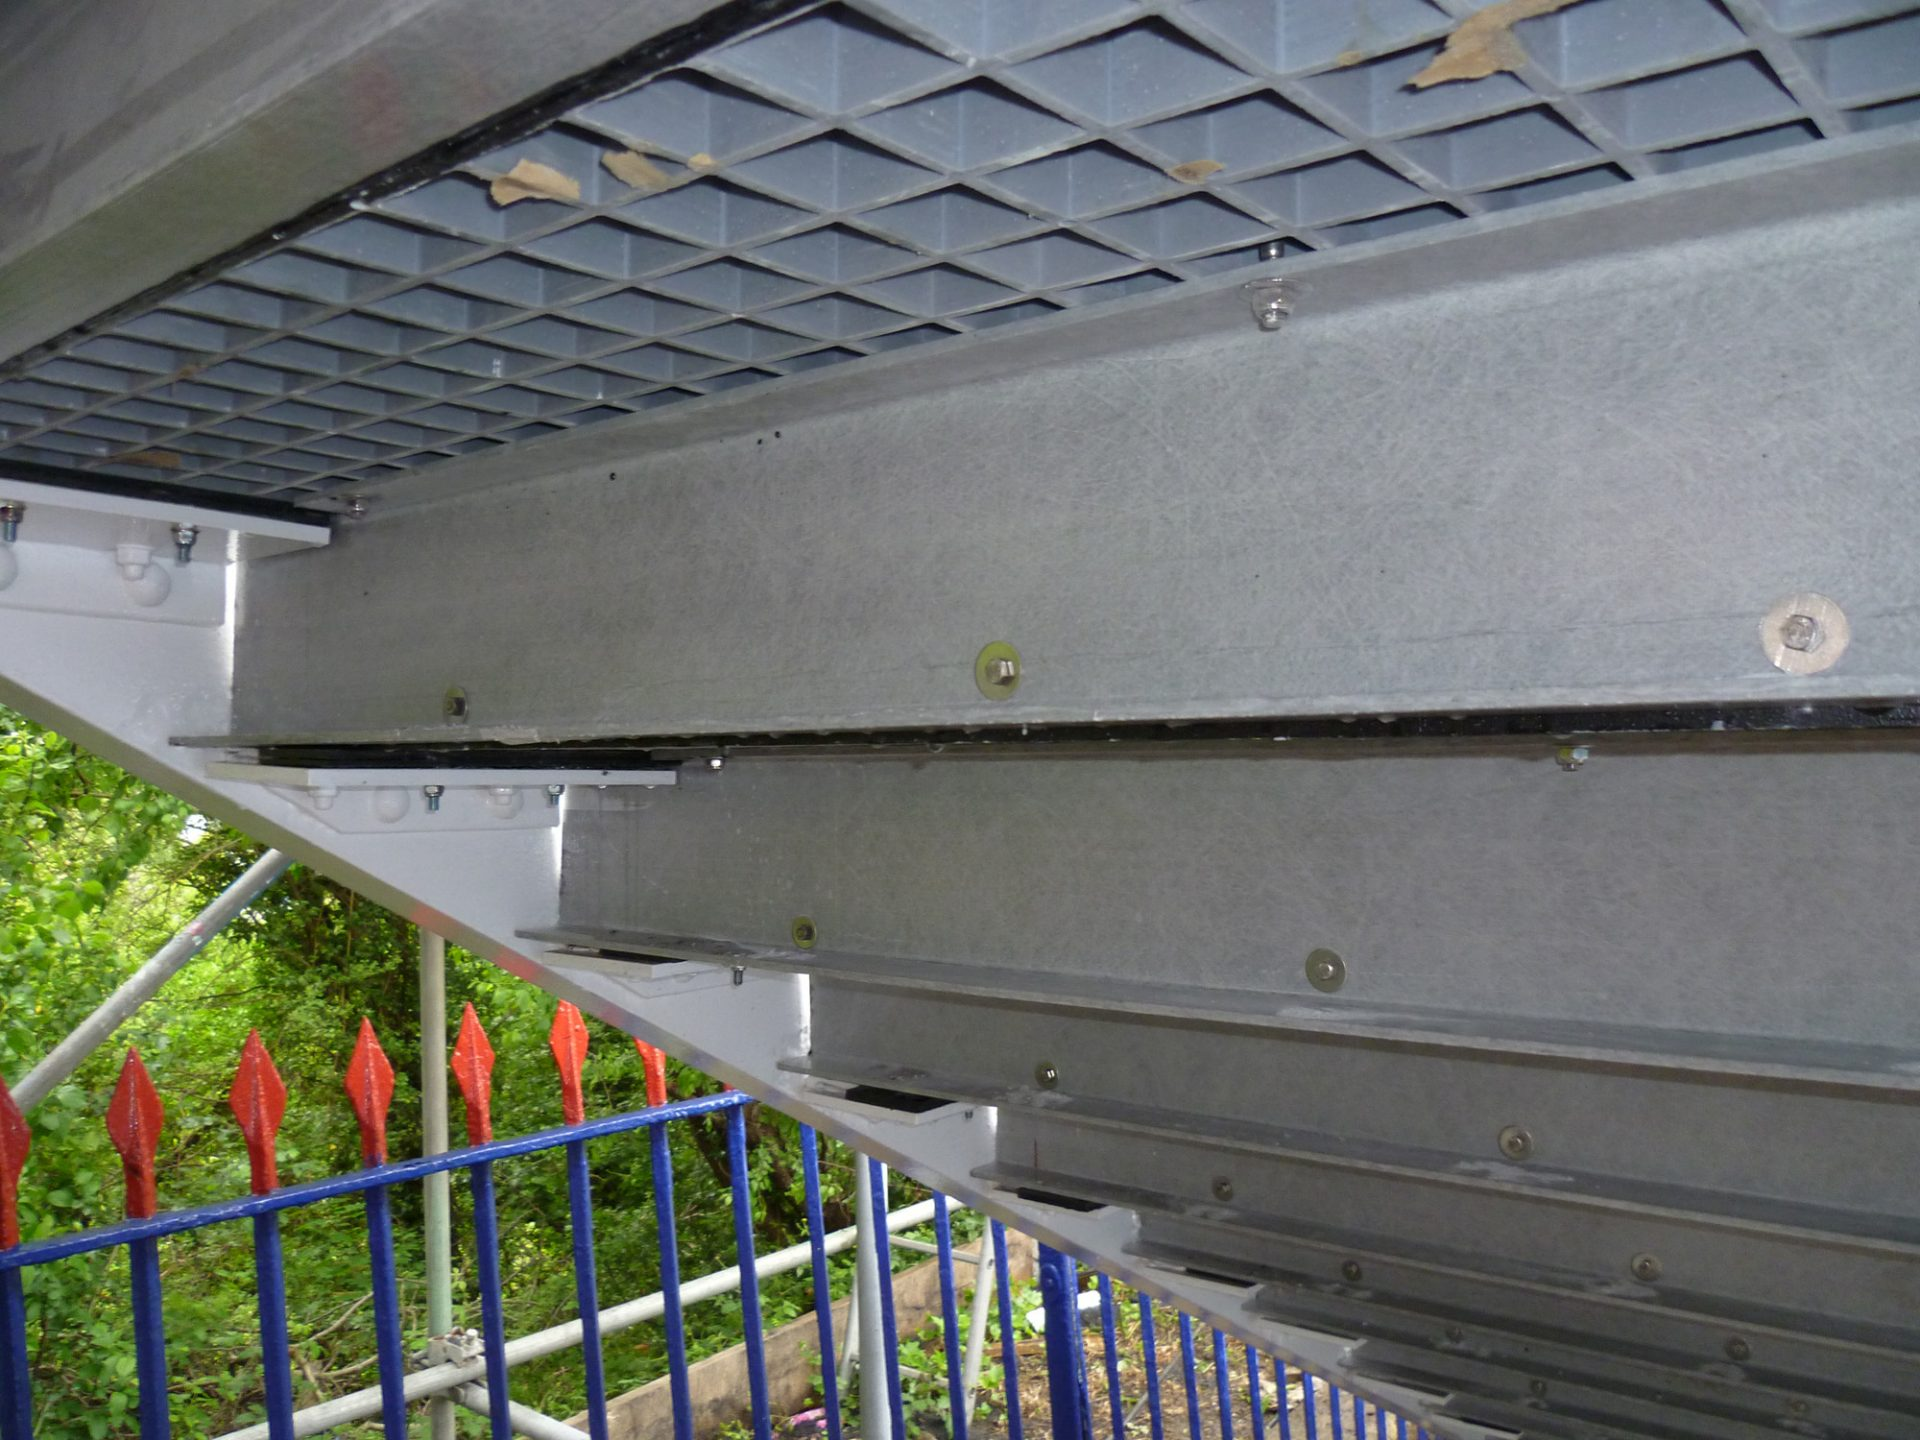 Underside of fibreglass load bearing stair treads replacing wood on historic footbridge